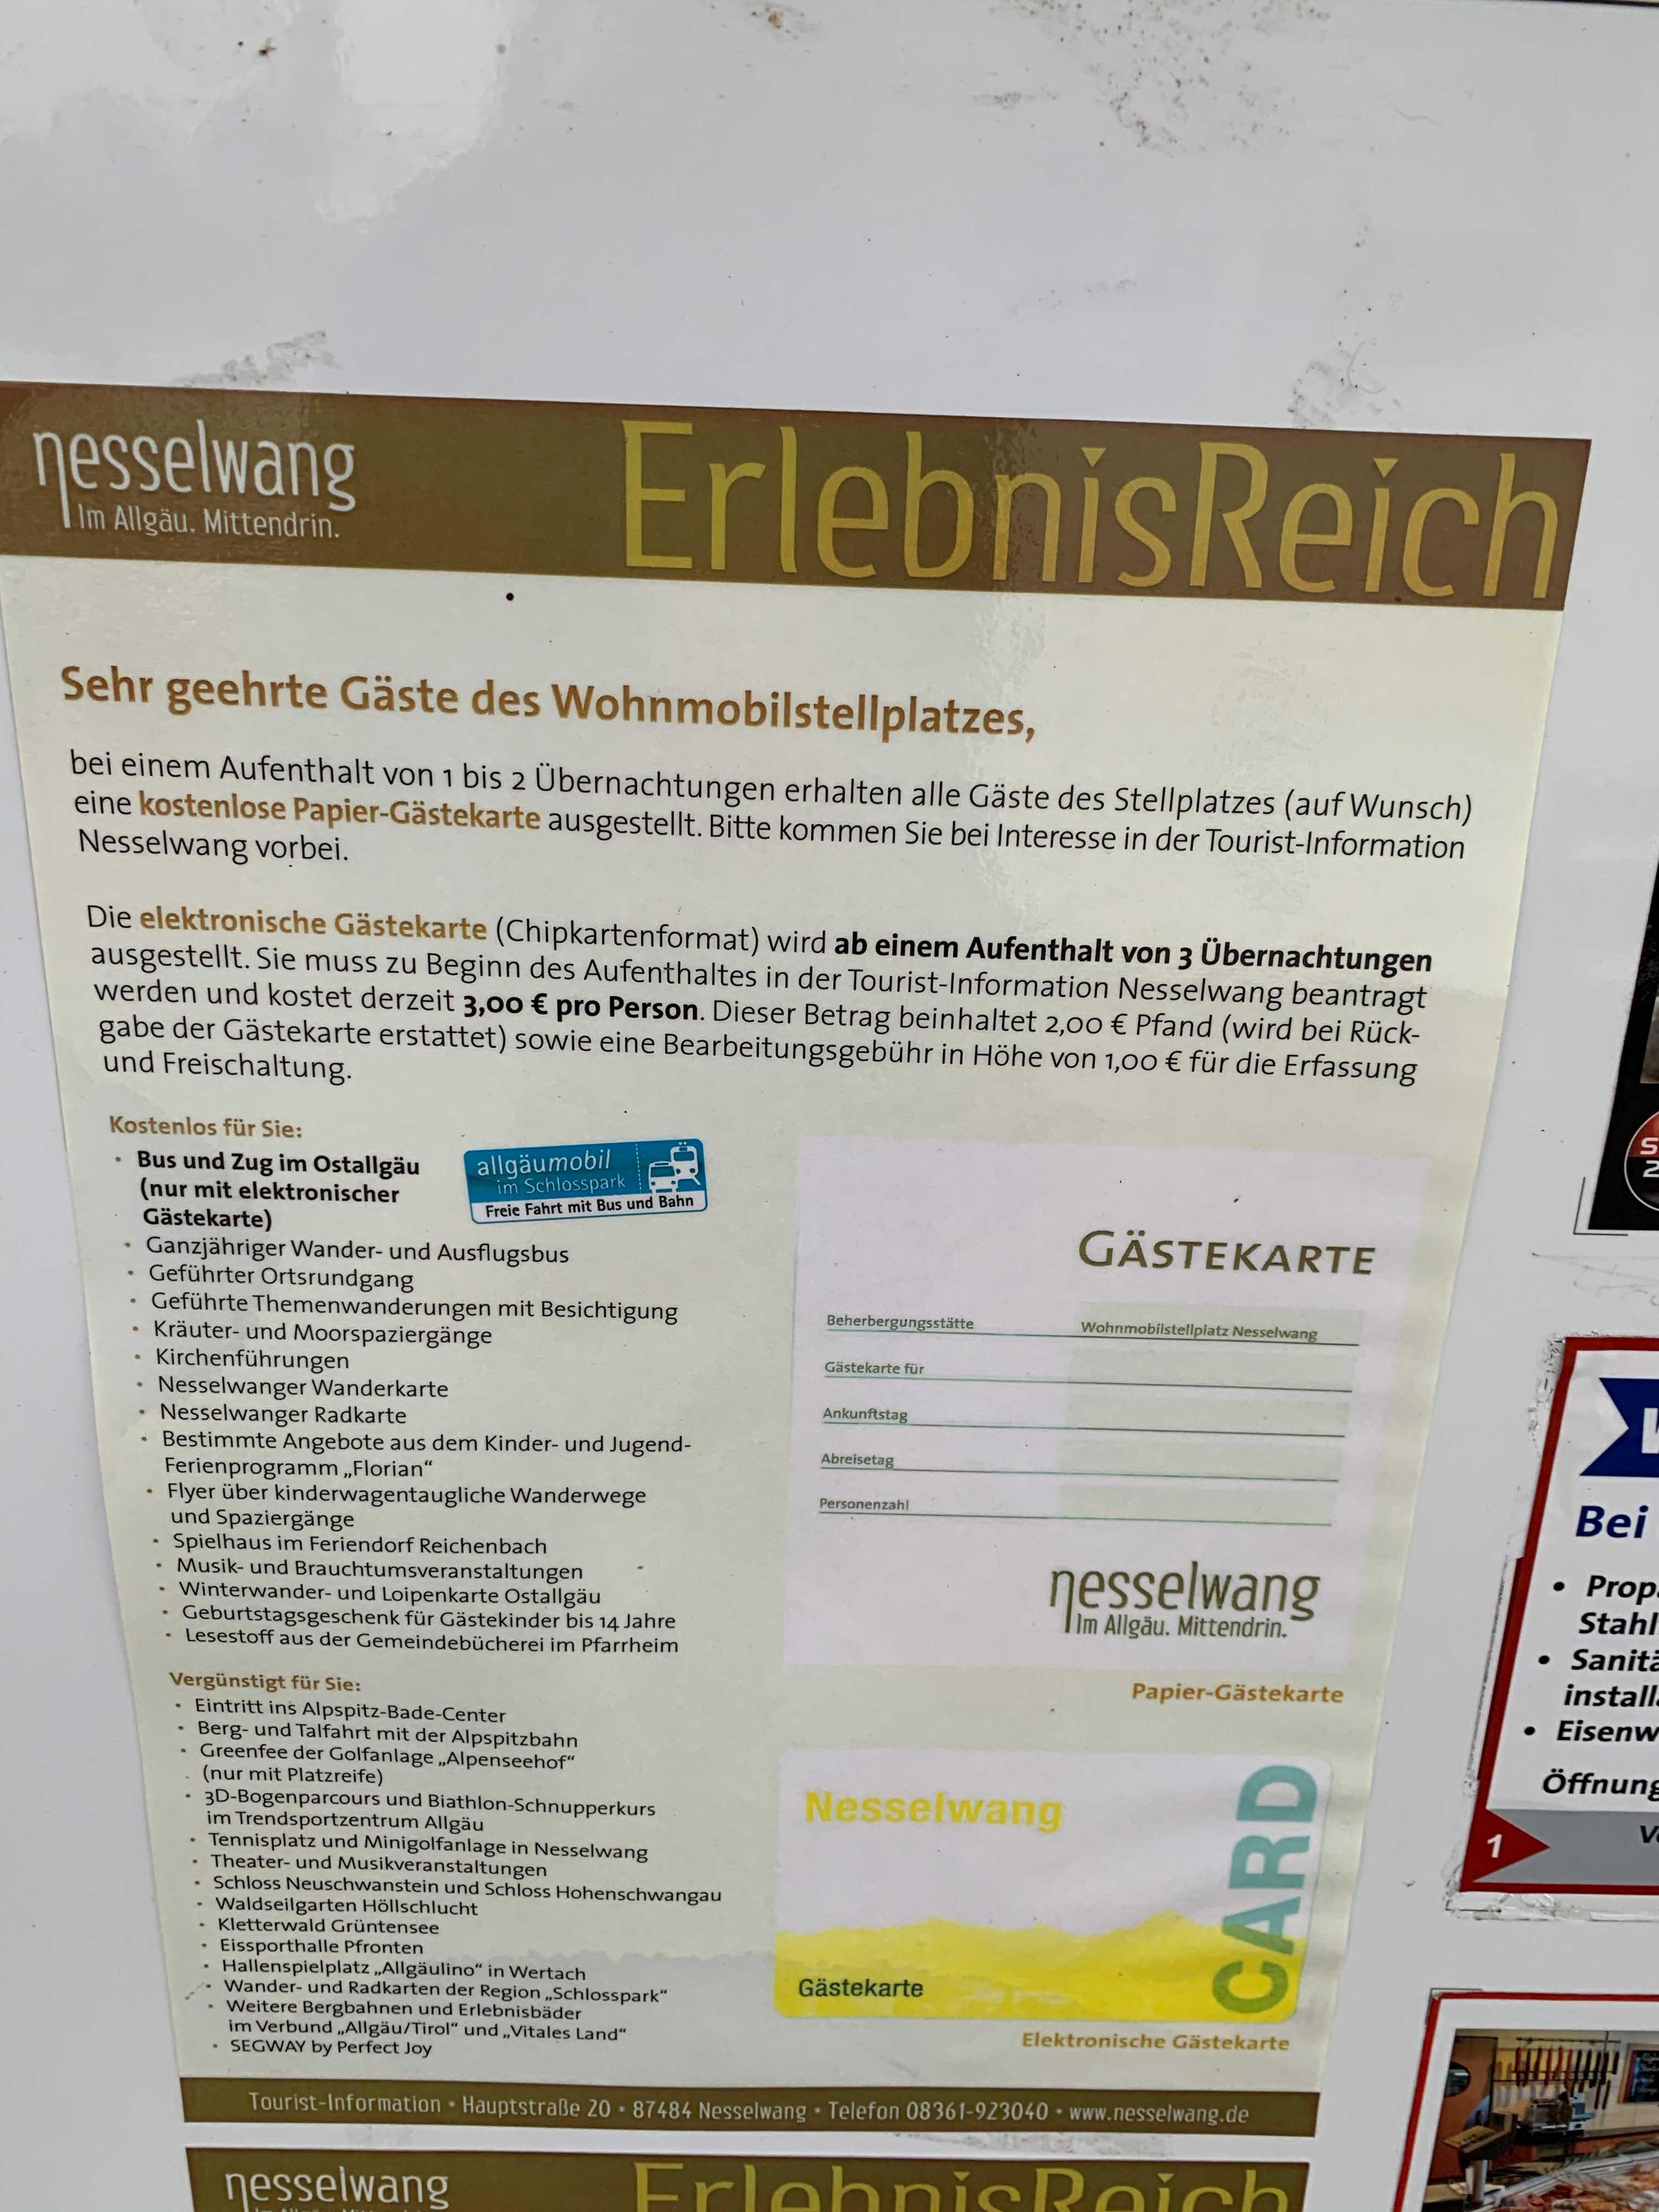 Wohnmobilstellplatz Nesselwang09